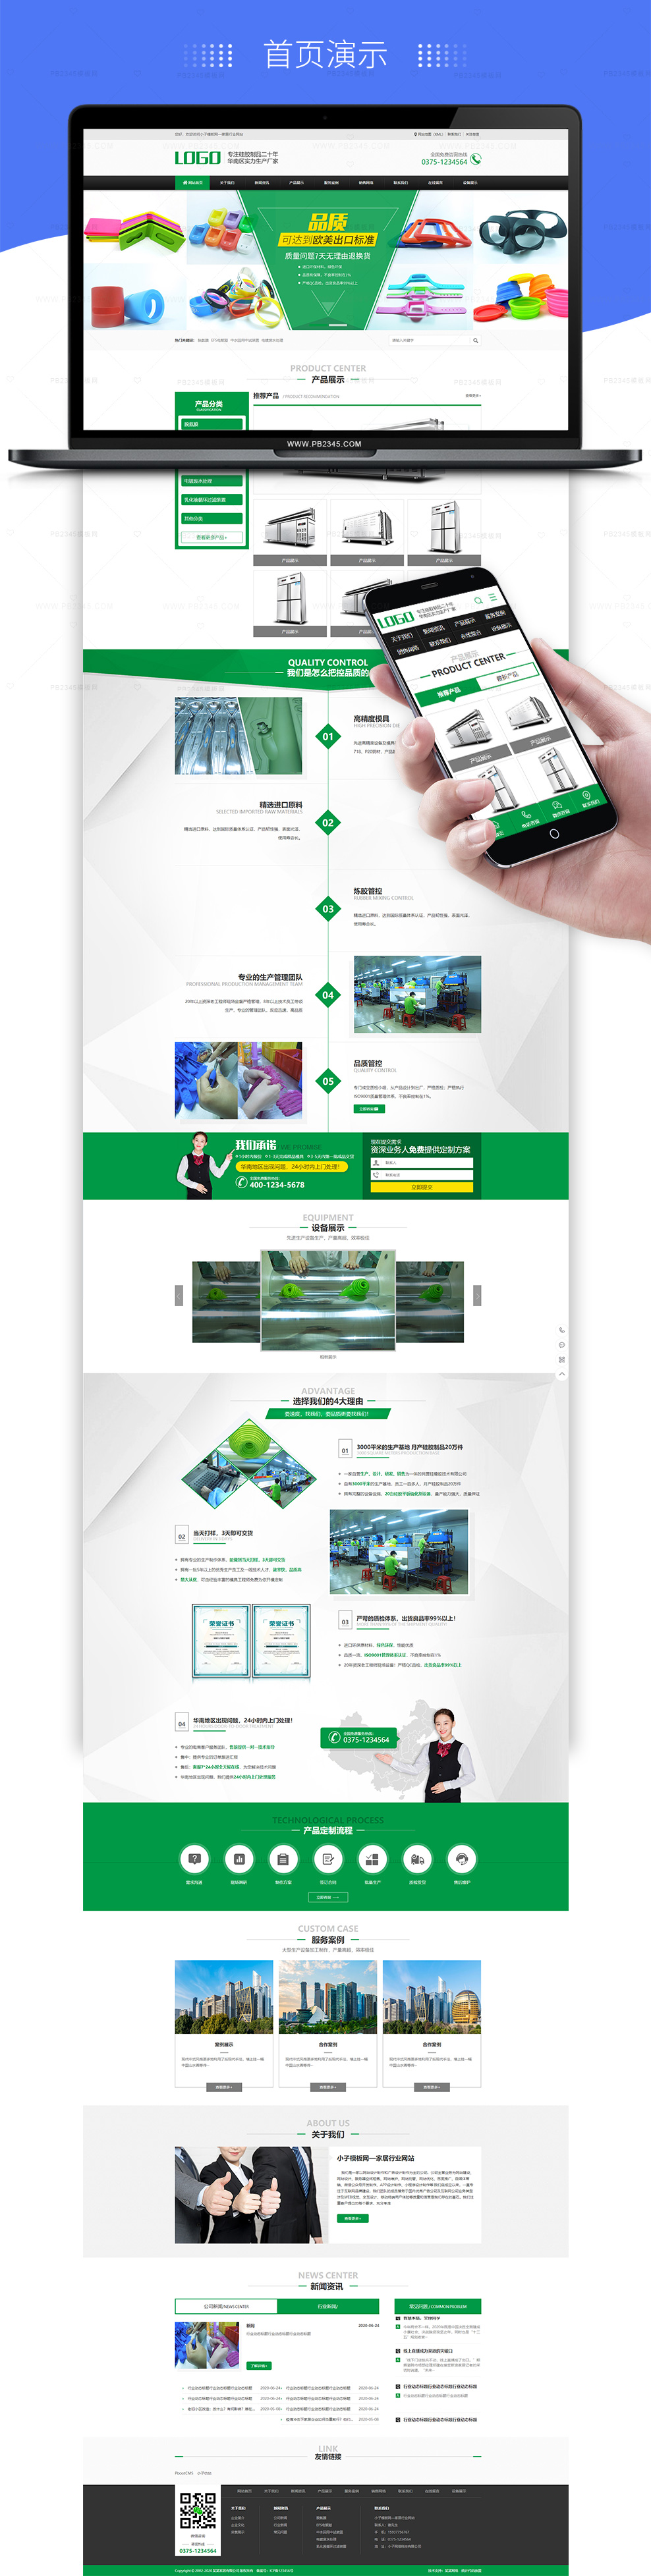 pbootcms绿色硅胶橡胶制品网站模板带手机端